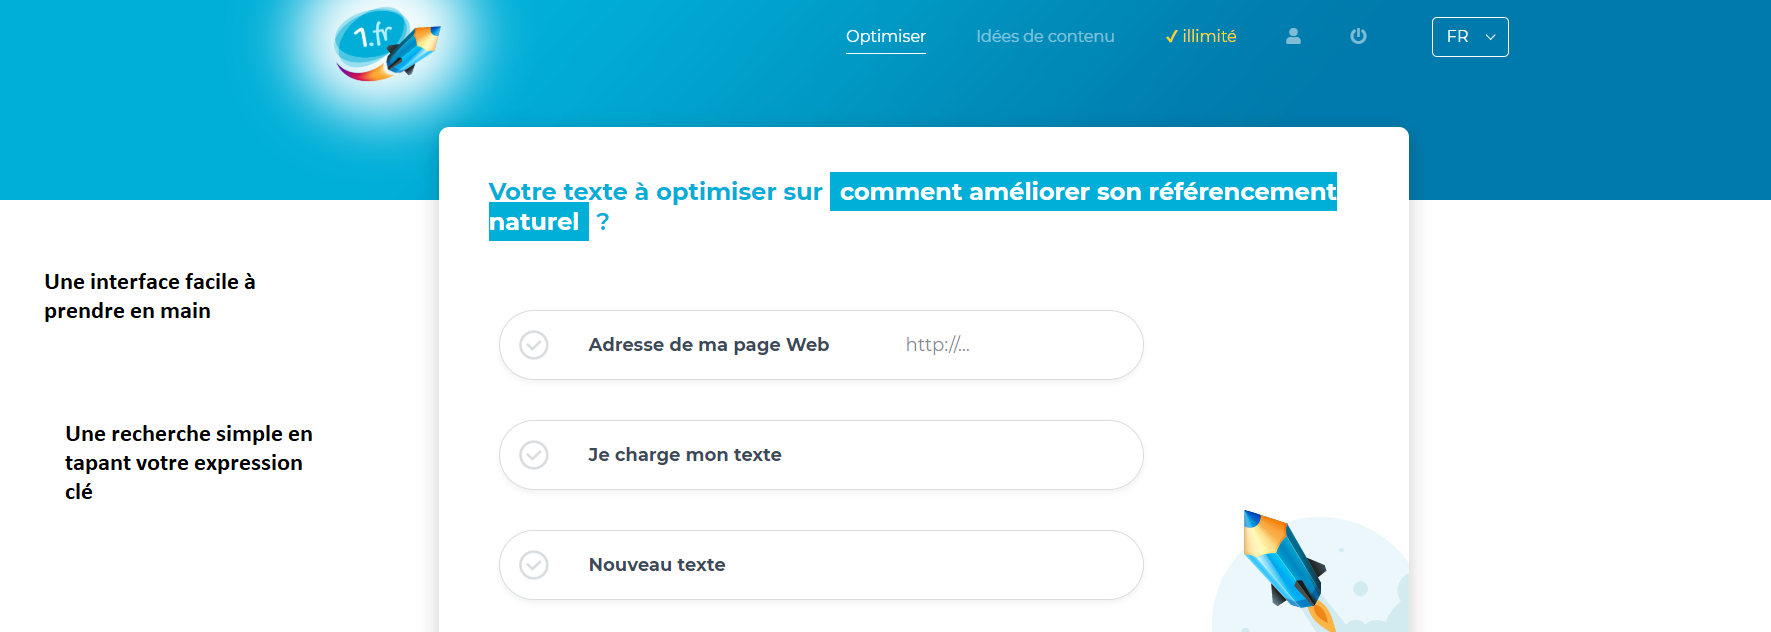 Optimiser un texte SEO avec 1.fr